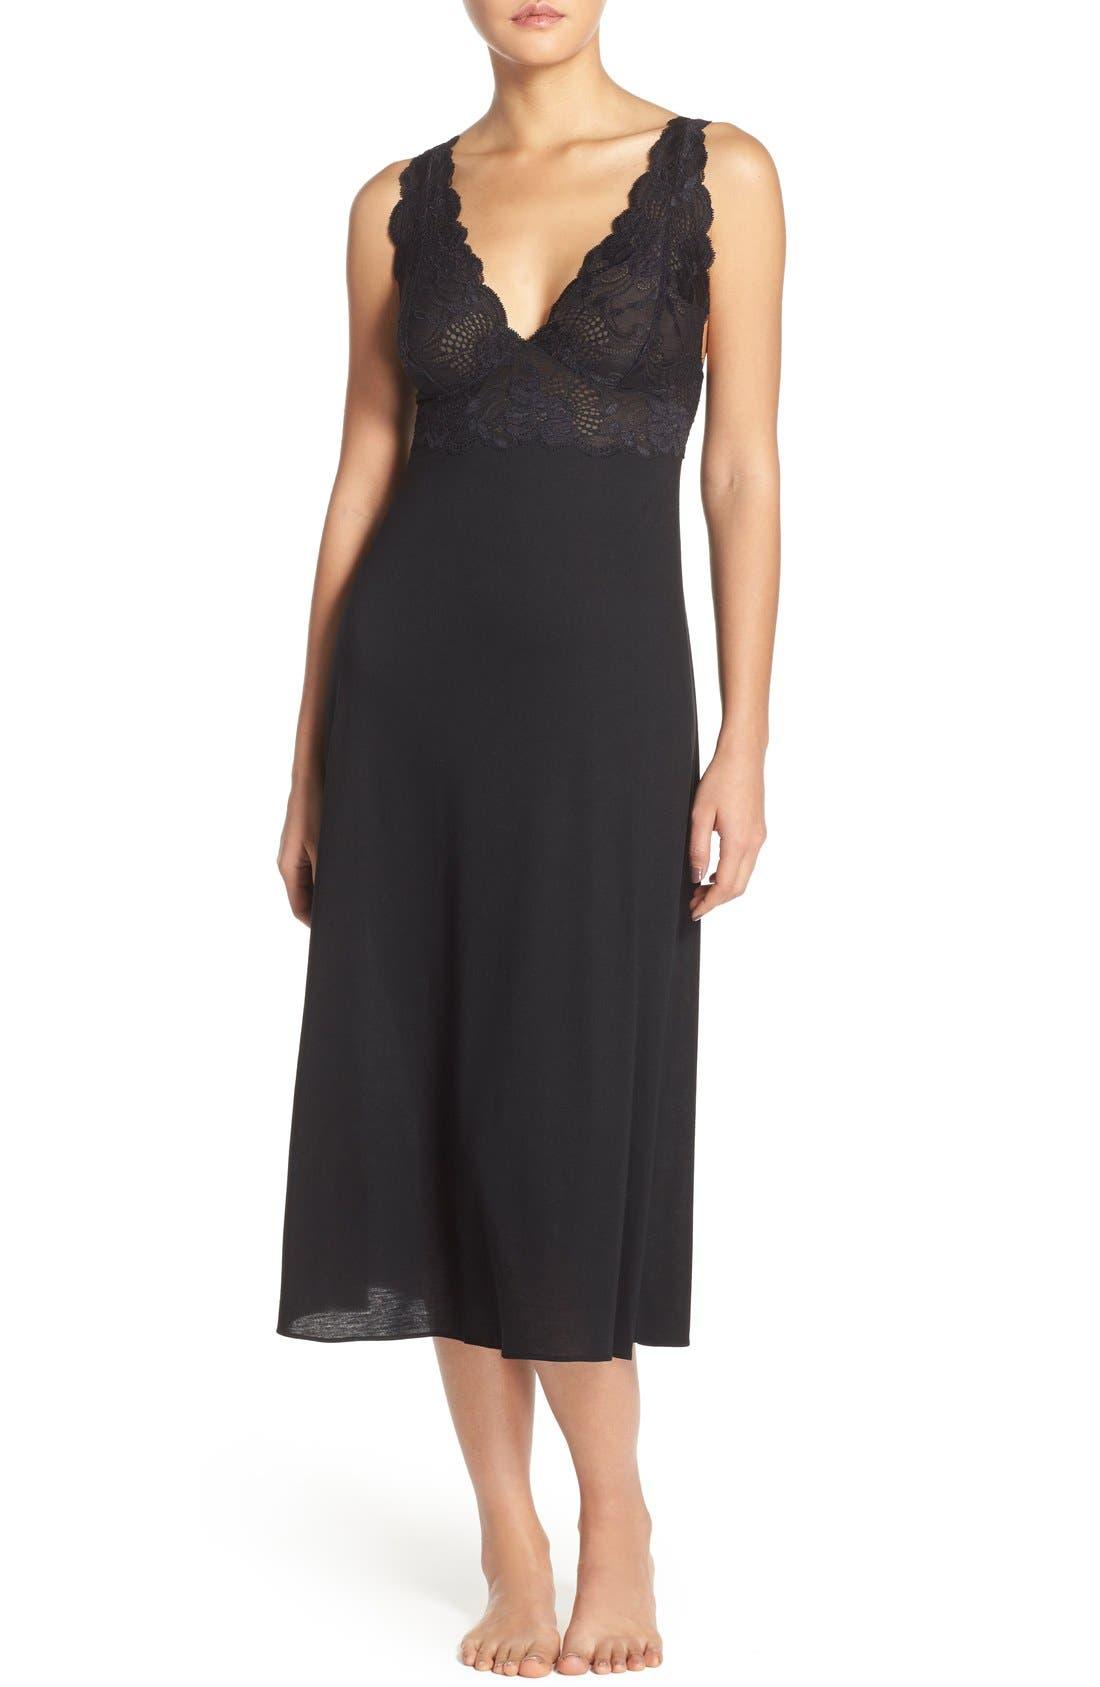 NATORI, 'Zen Floral' Nightgown, Main thumbnail 1, color, BLACK